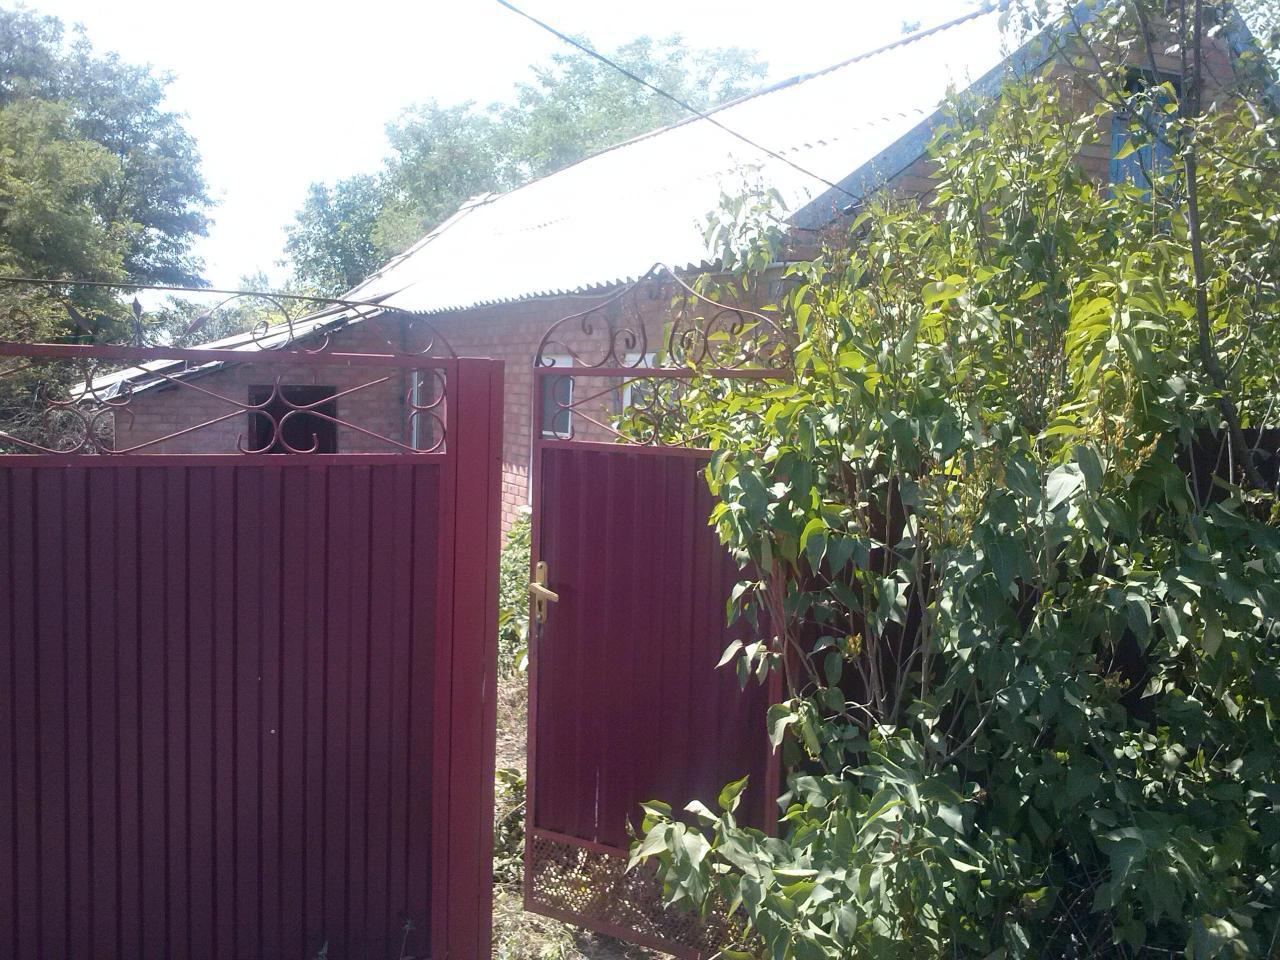 ПРОДАЮ домик(ветхий) участок 0.23га | фото 1 из 1